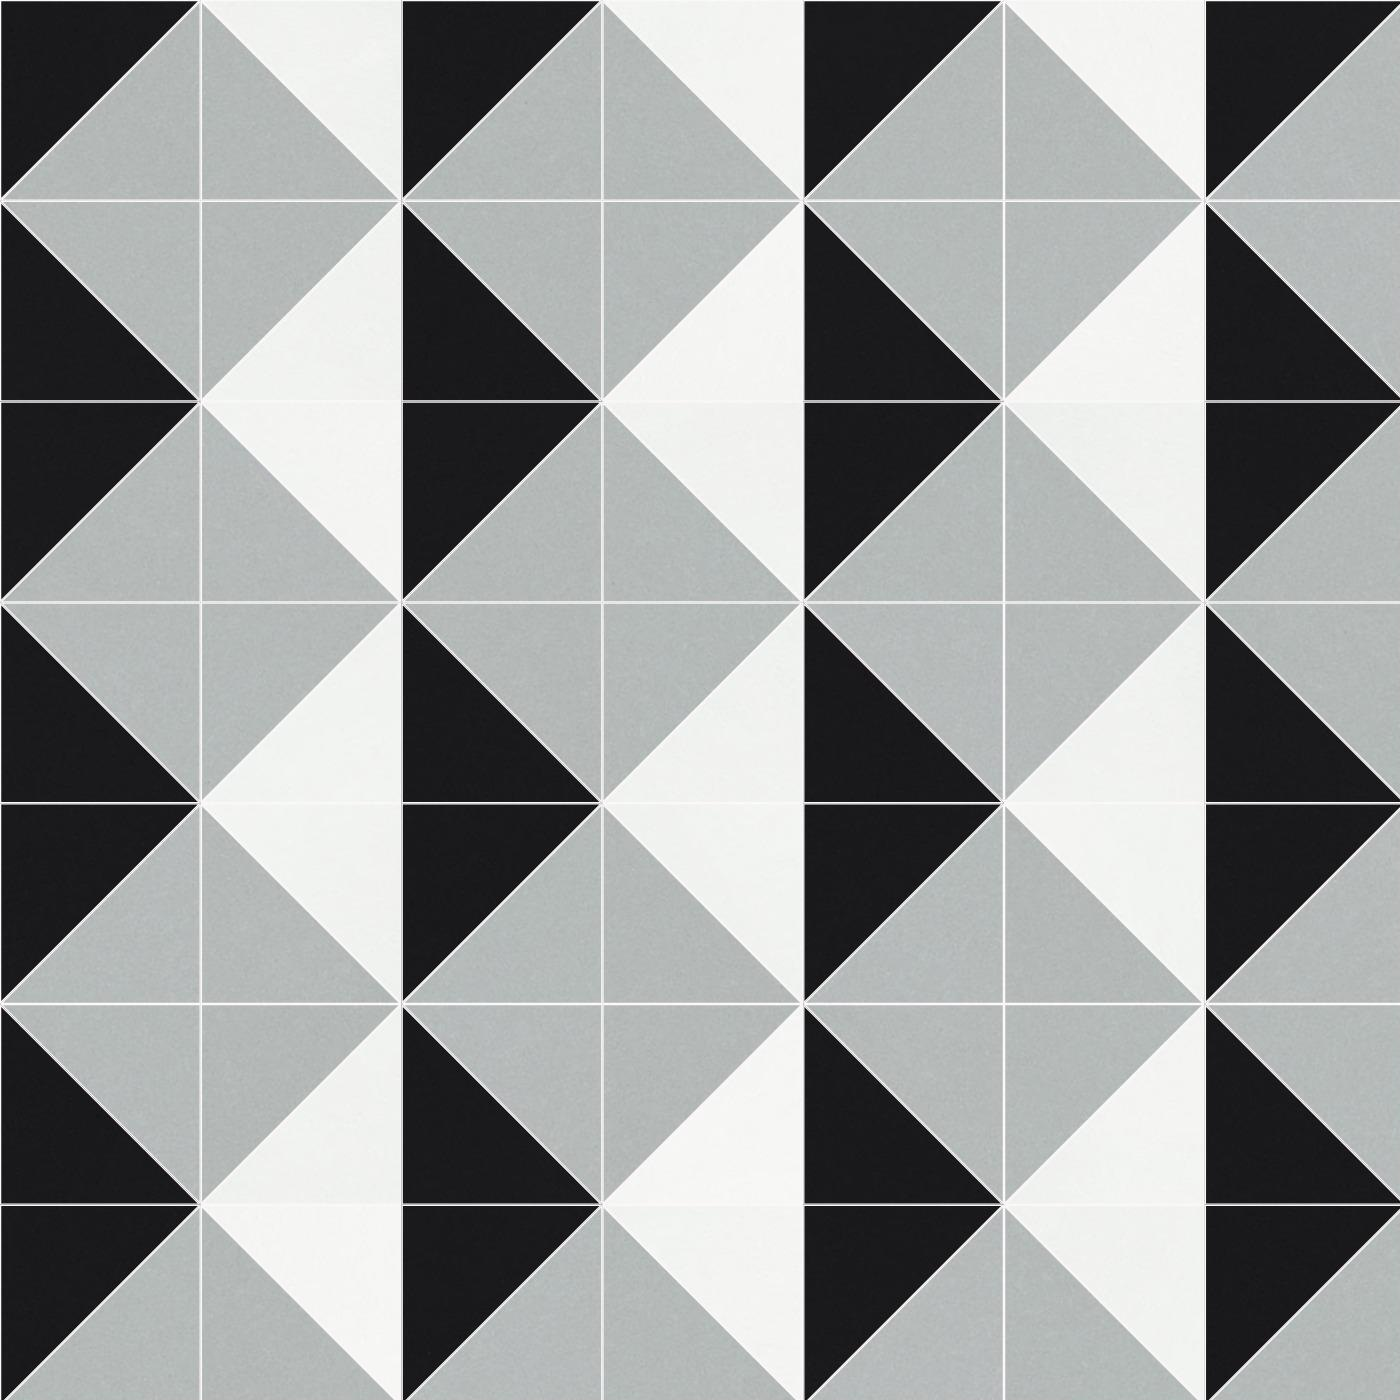 audreylane-right_triangle-d.jpg